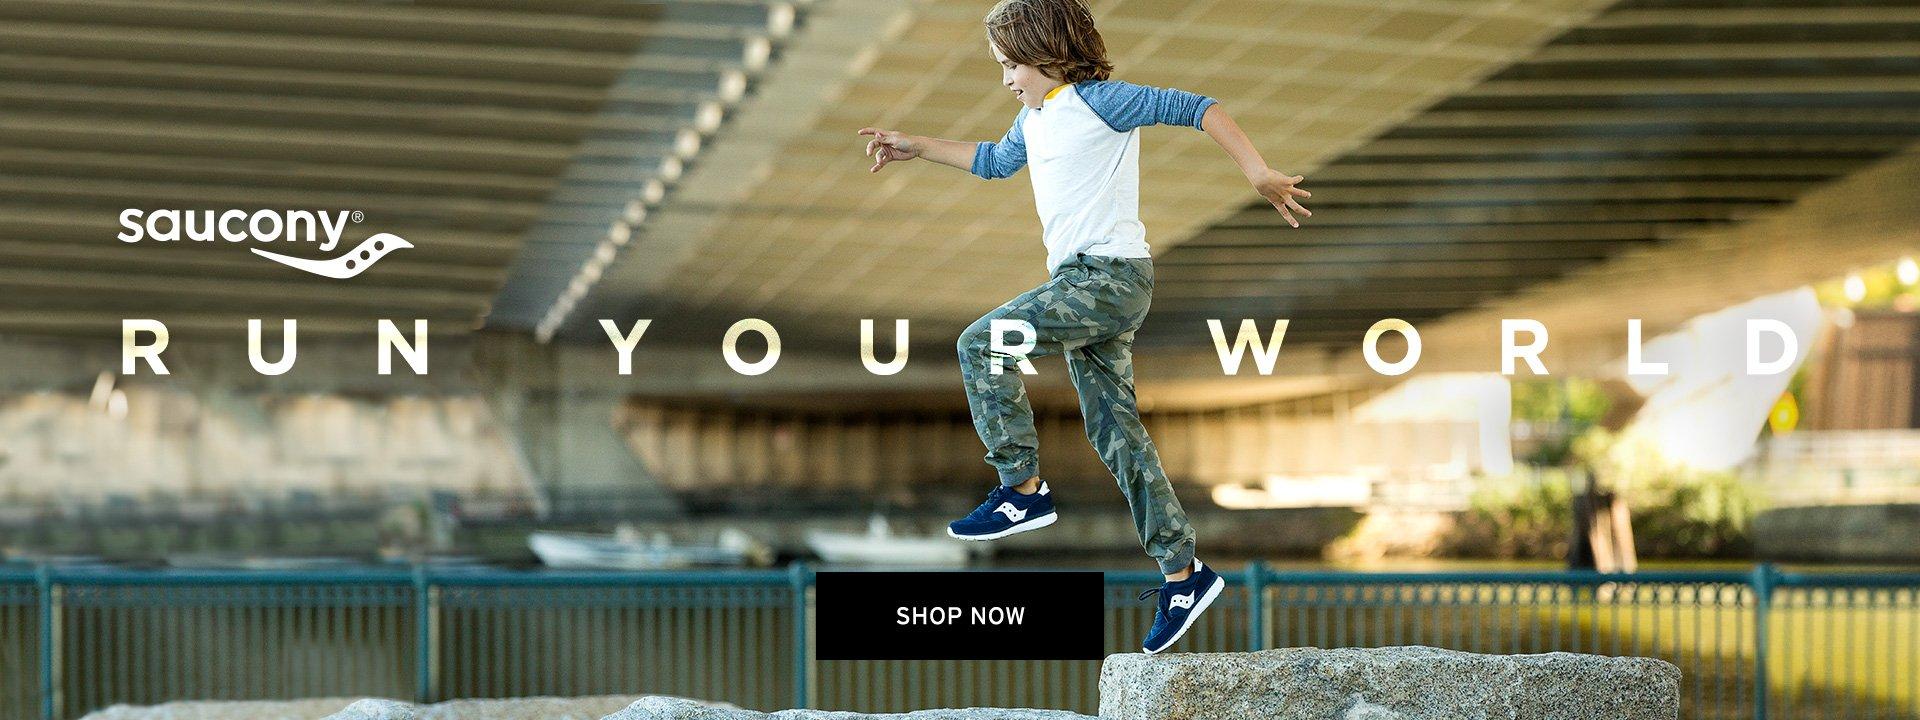 Saucony. Run Your World. Shop Now